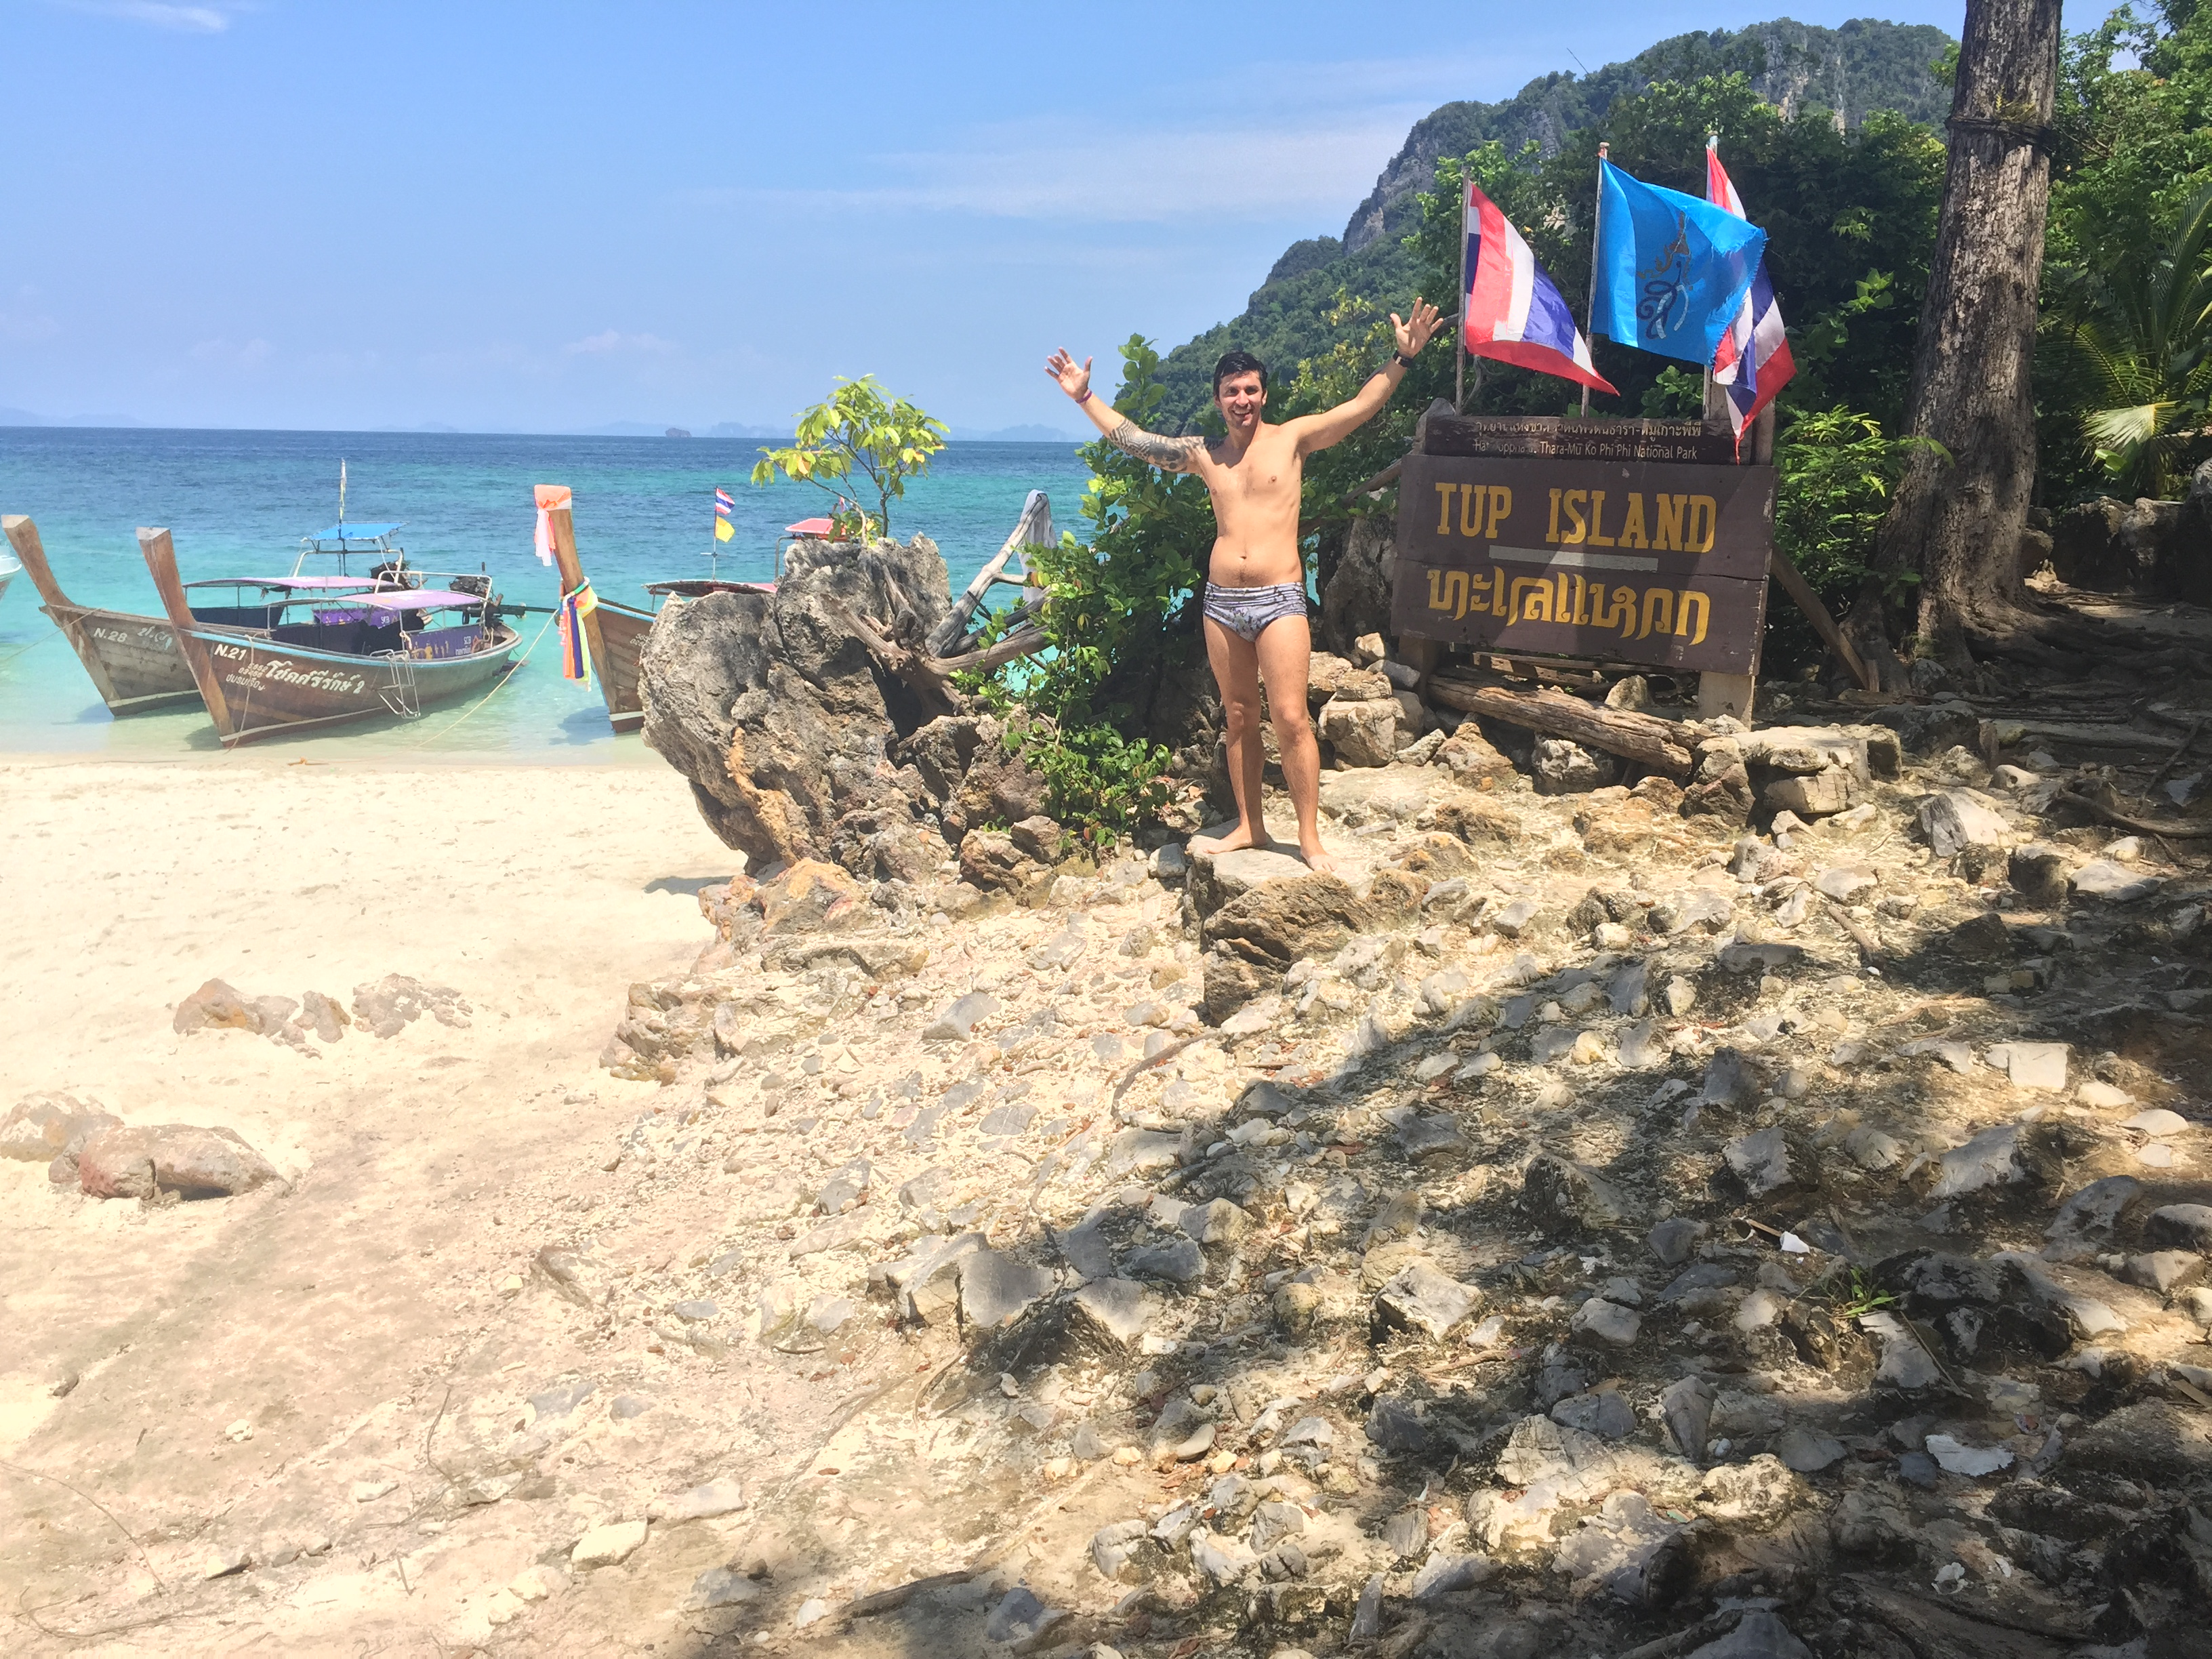 Top island Krabi